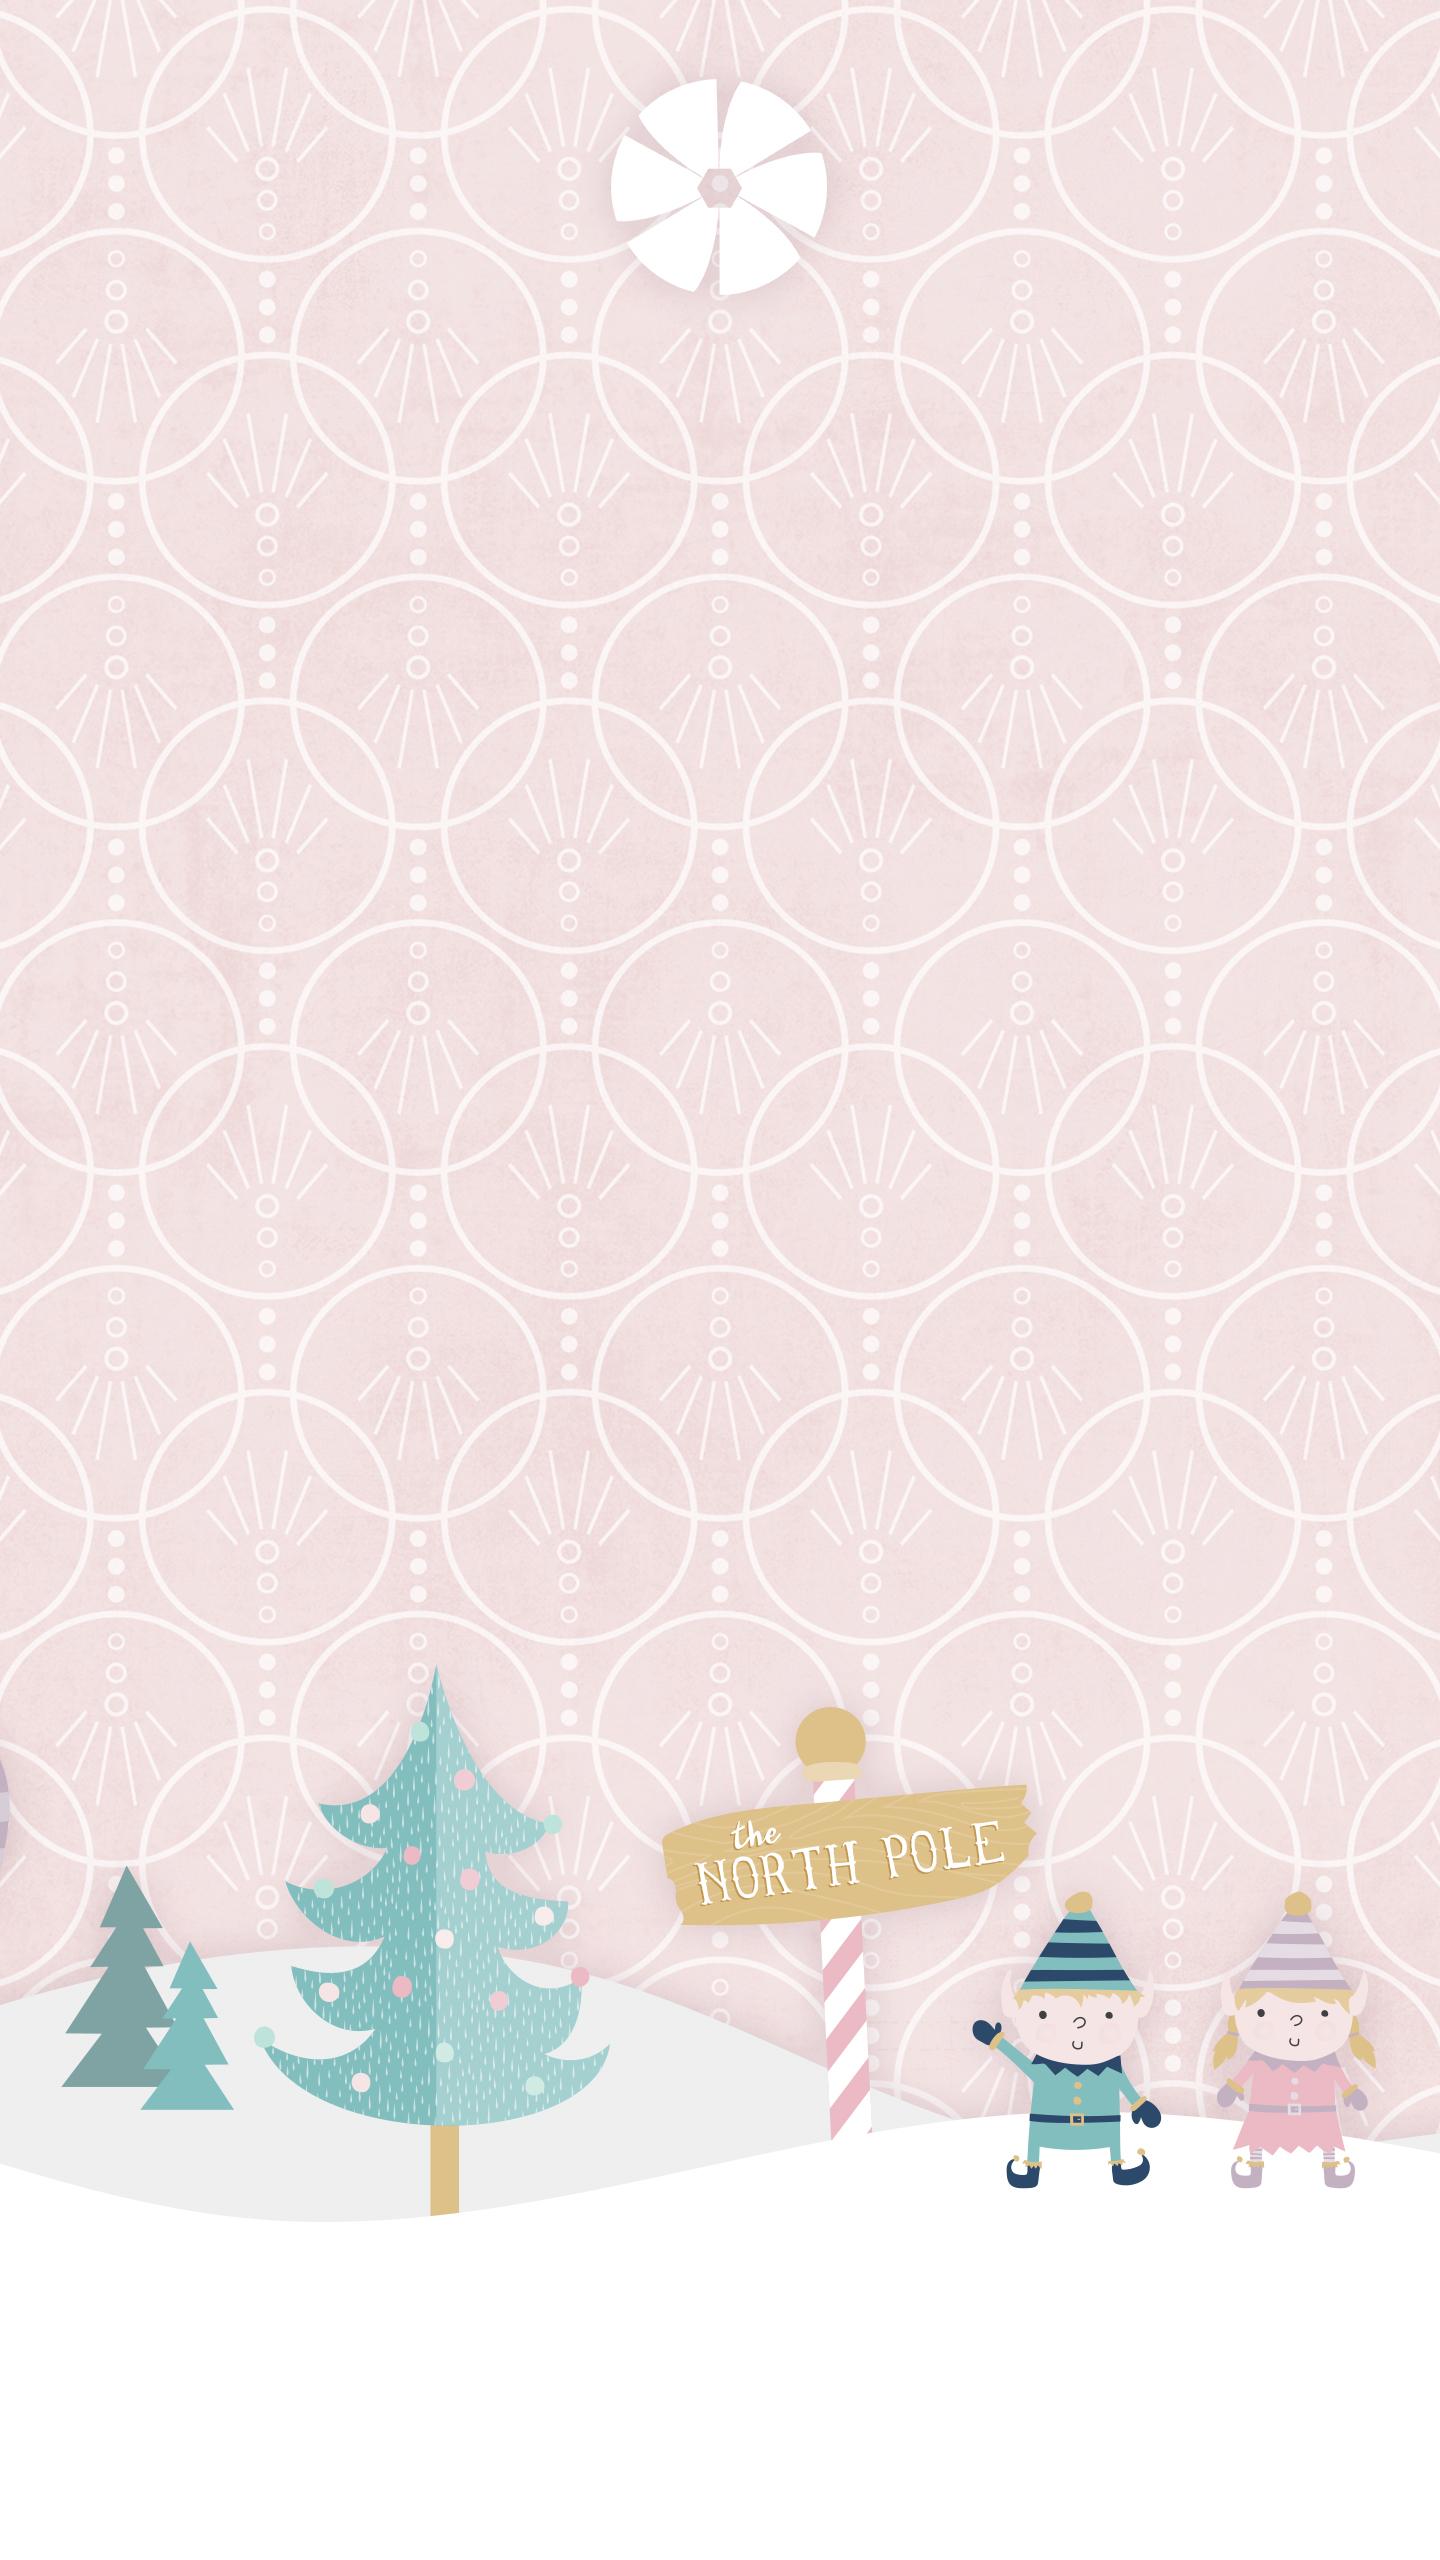 Download Sugarplum Forest Snowfall Wallpaper · Download Sugarplum North Pole Wallpaper ...